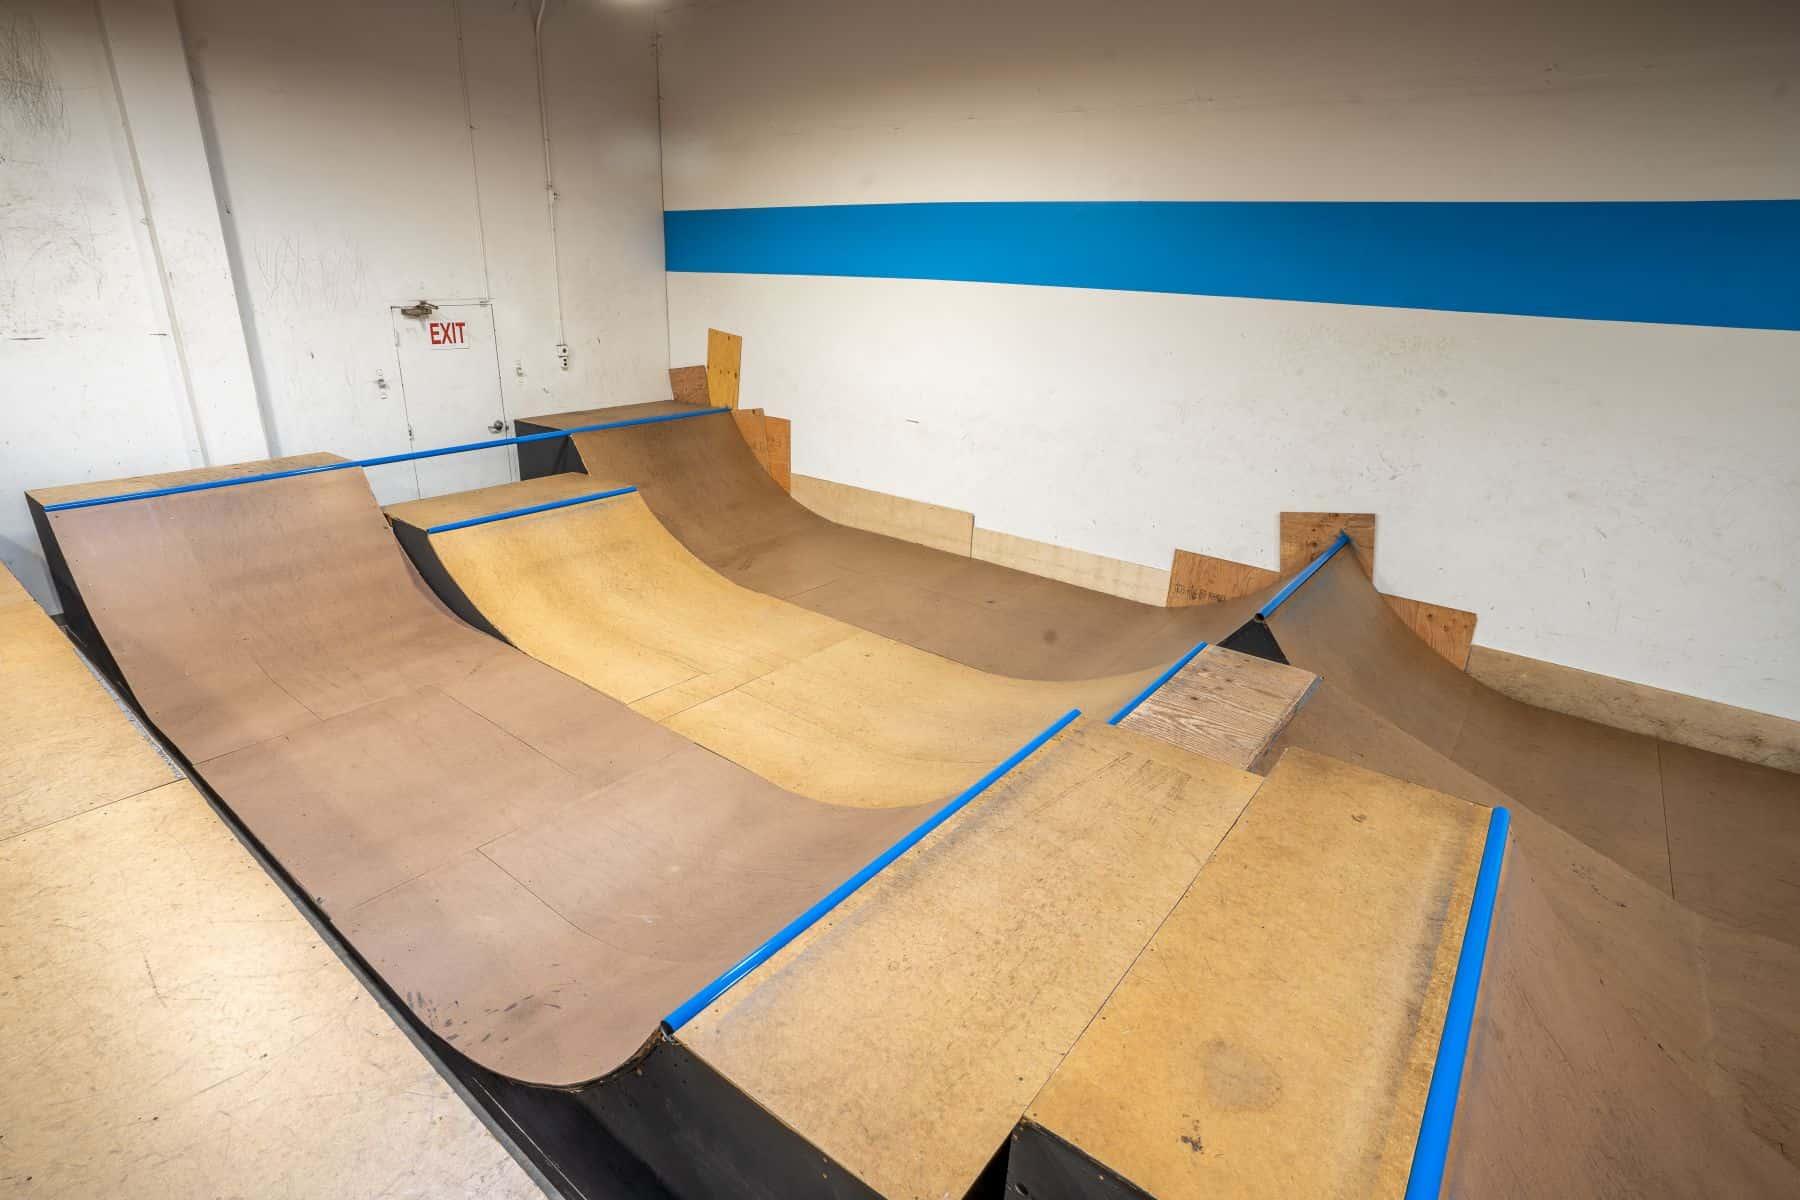 Rob Skate - San Leandro Private Skatepark 26